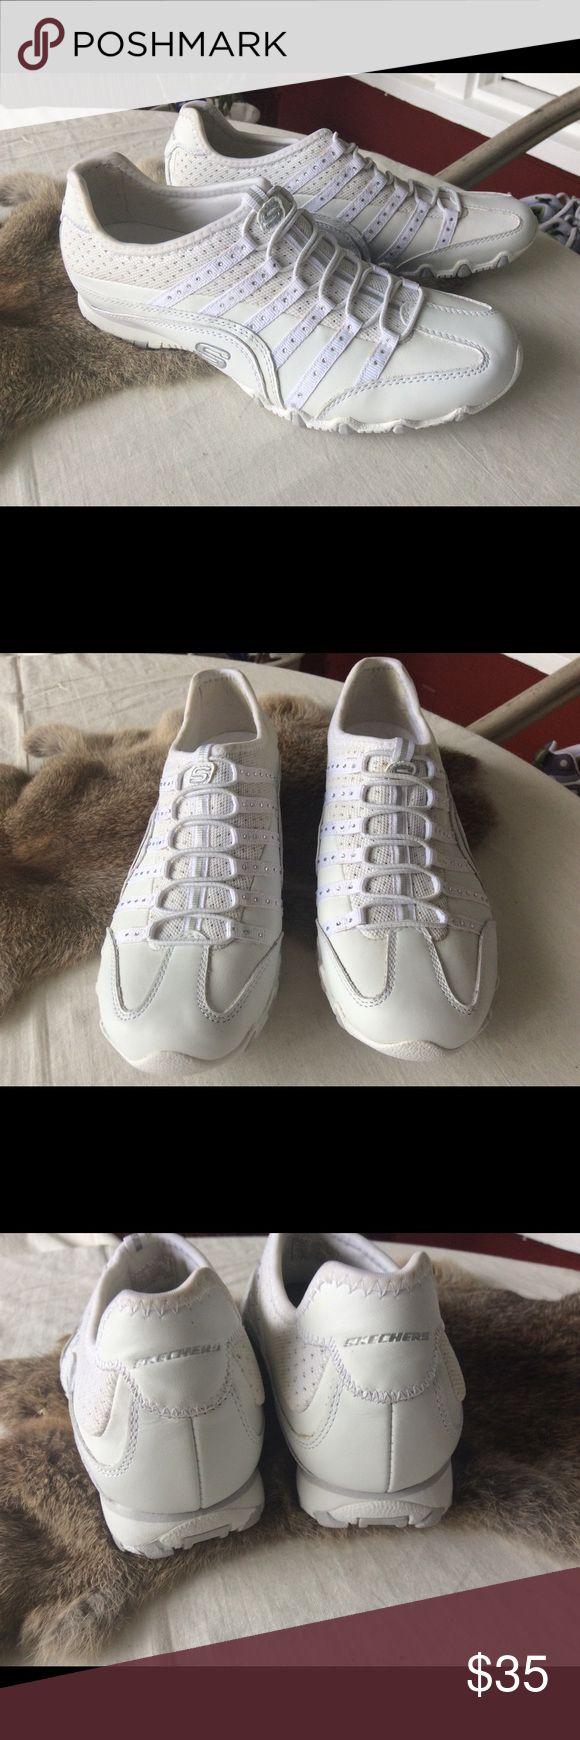 Skechers Slip on Sneakers New Crystal embellishments.  Leather upper. Skechers Shoes Sneakers